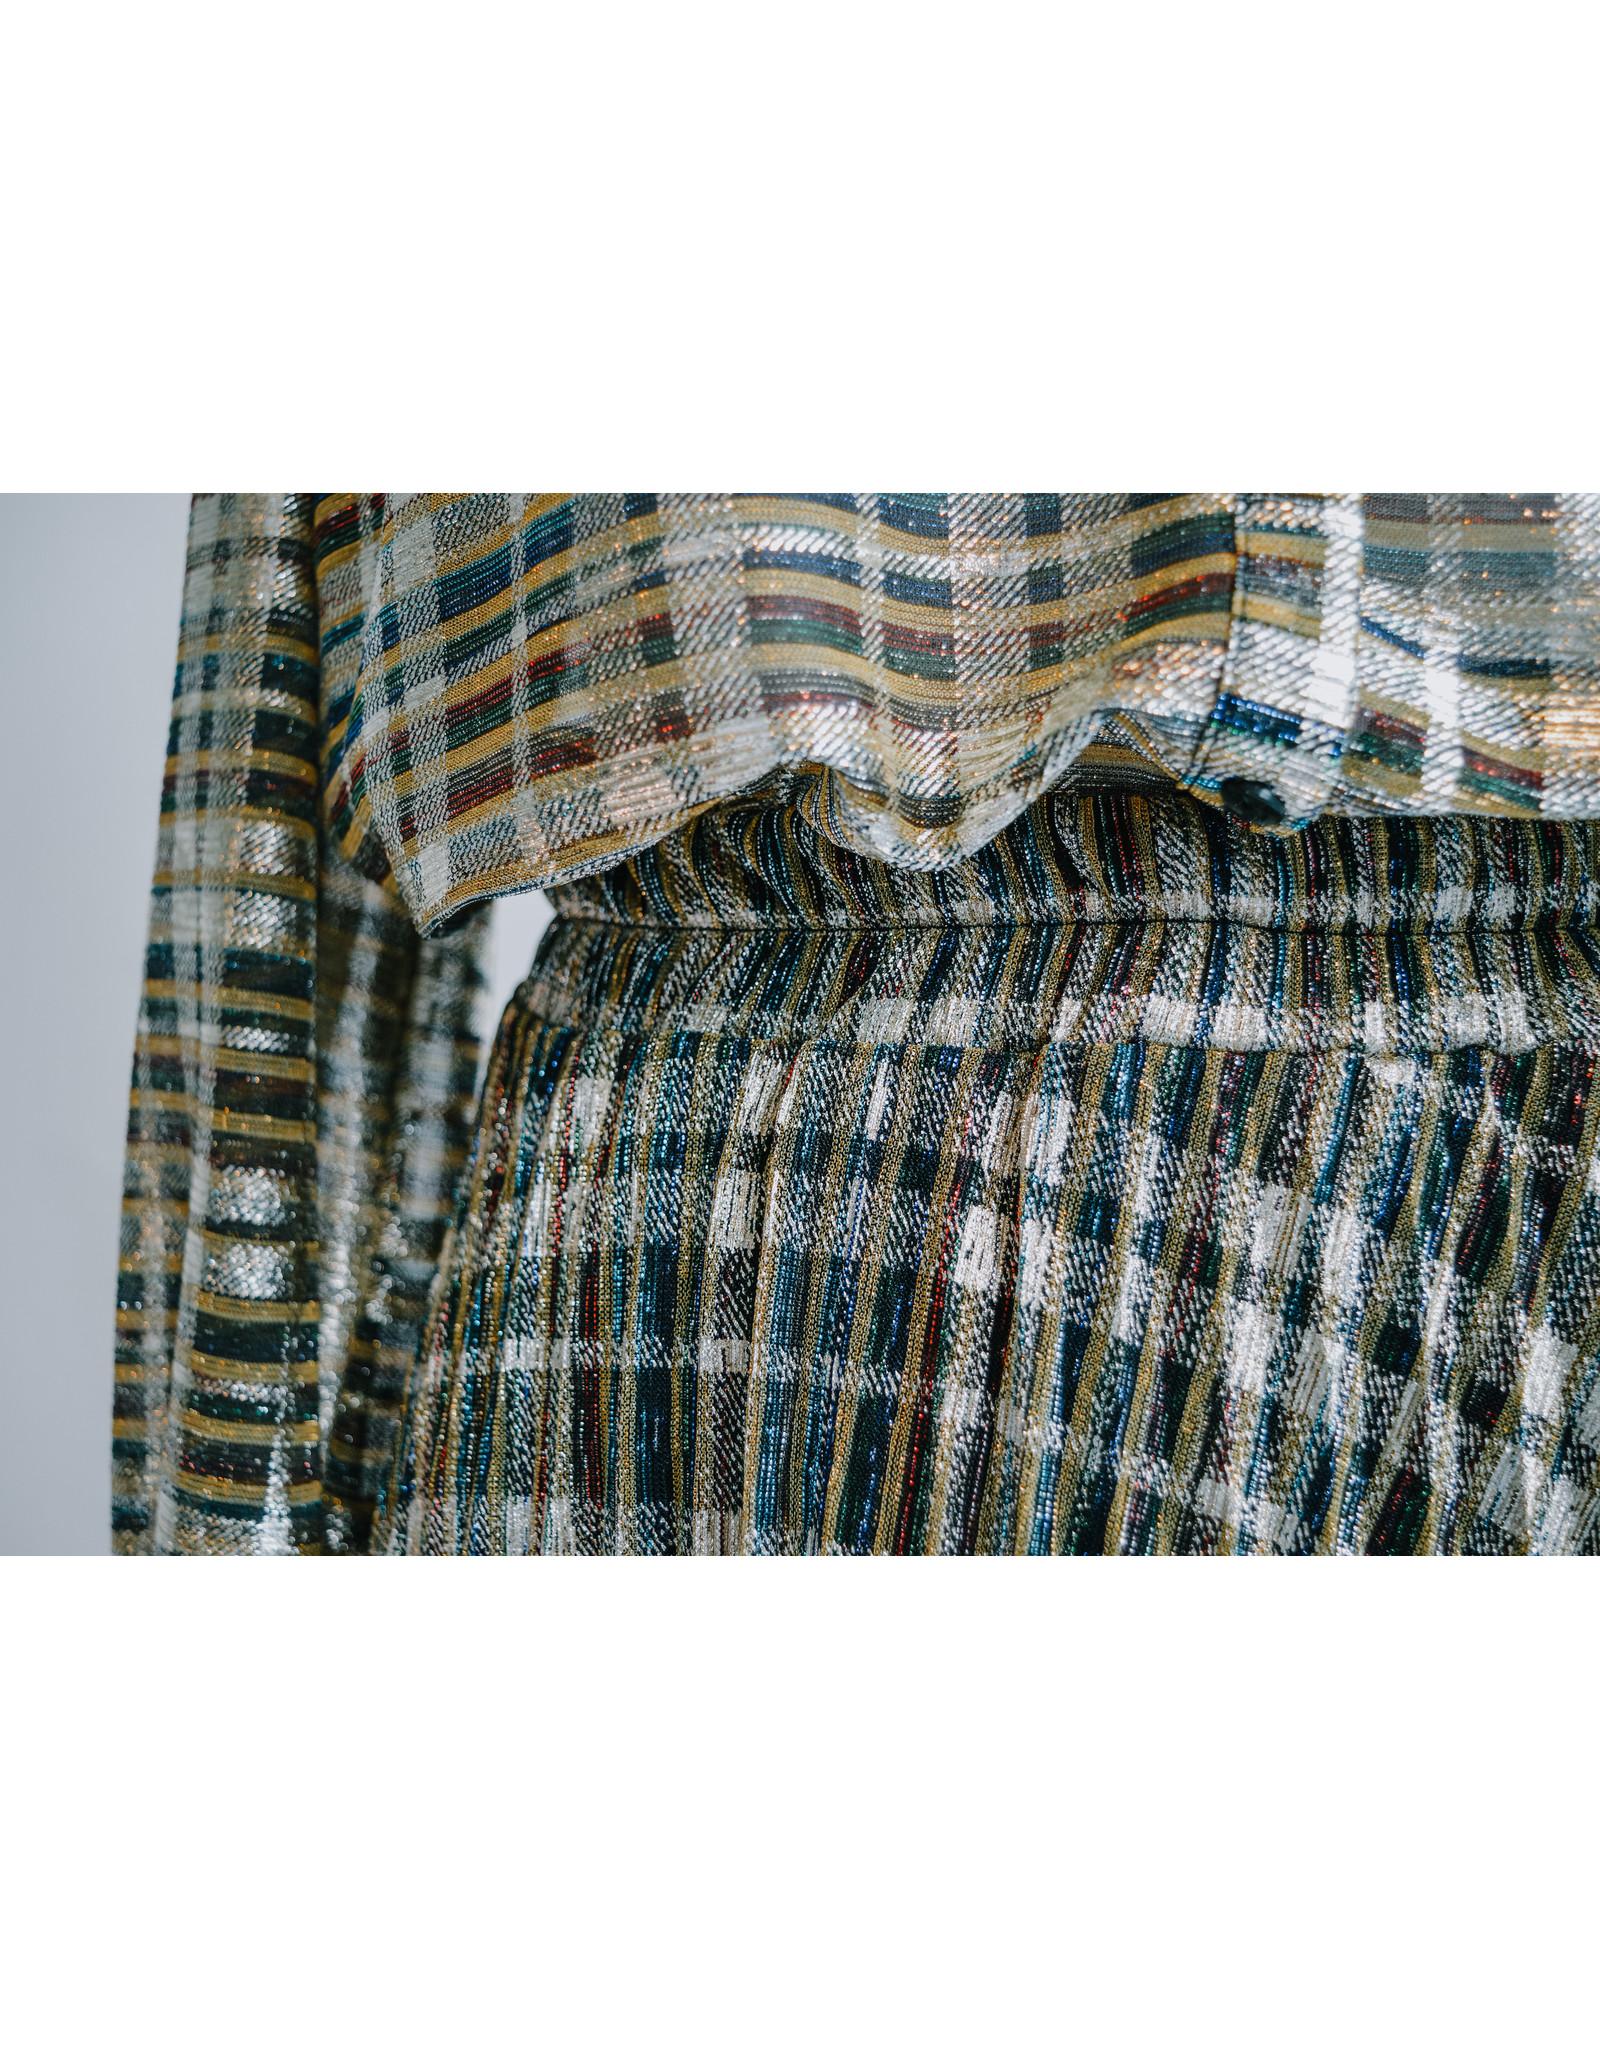 Imprévu jupe plisse lurex  goud met kleuren